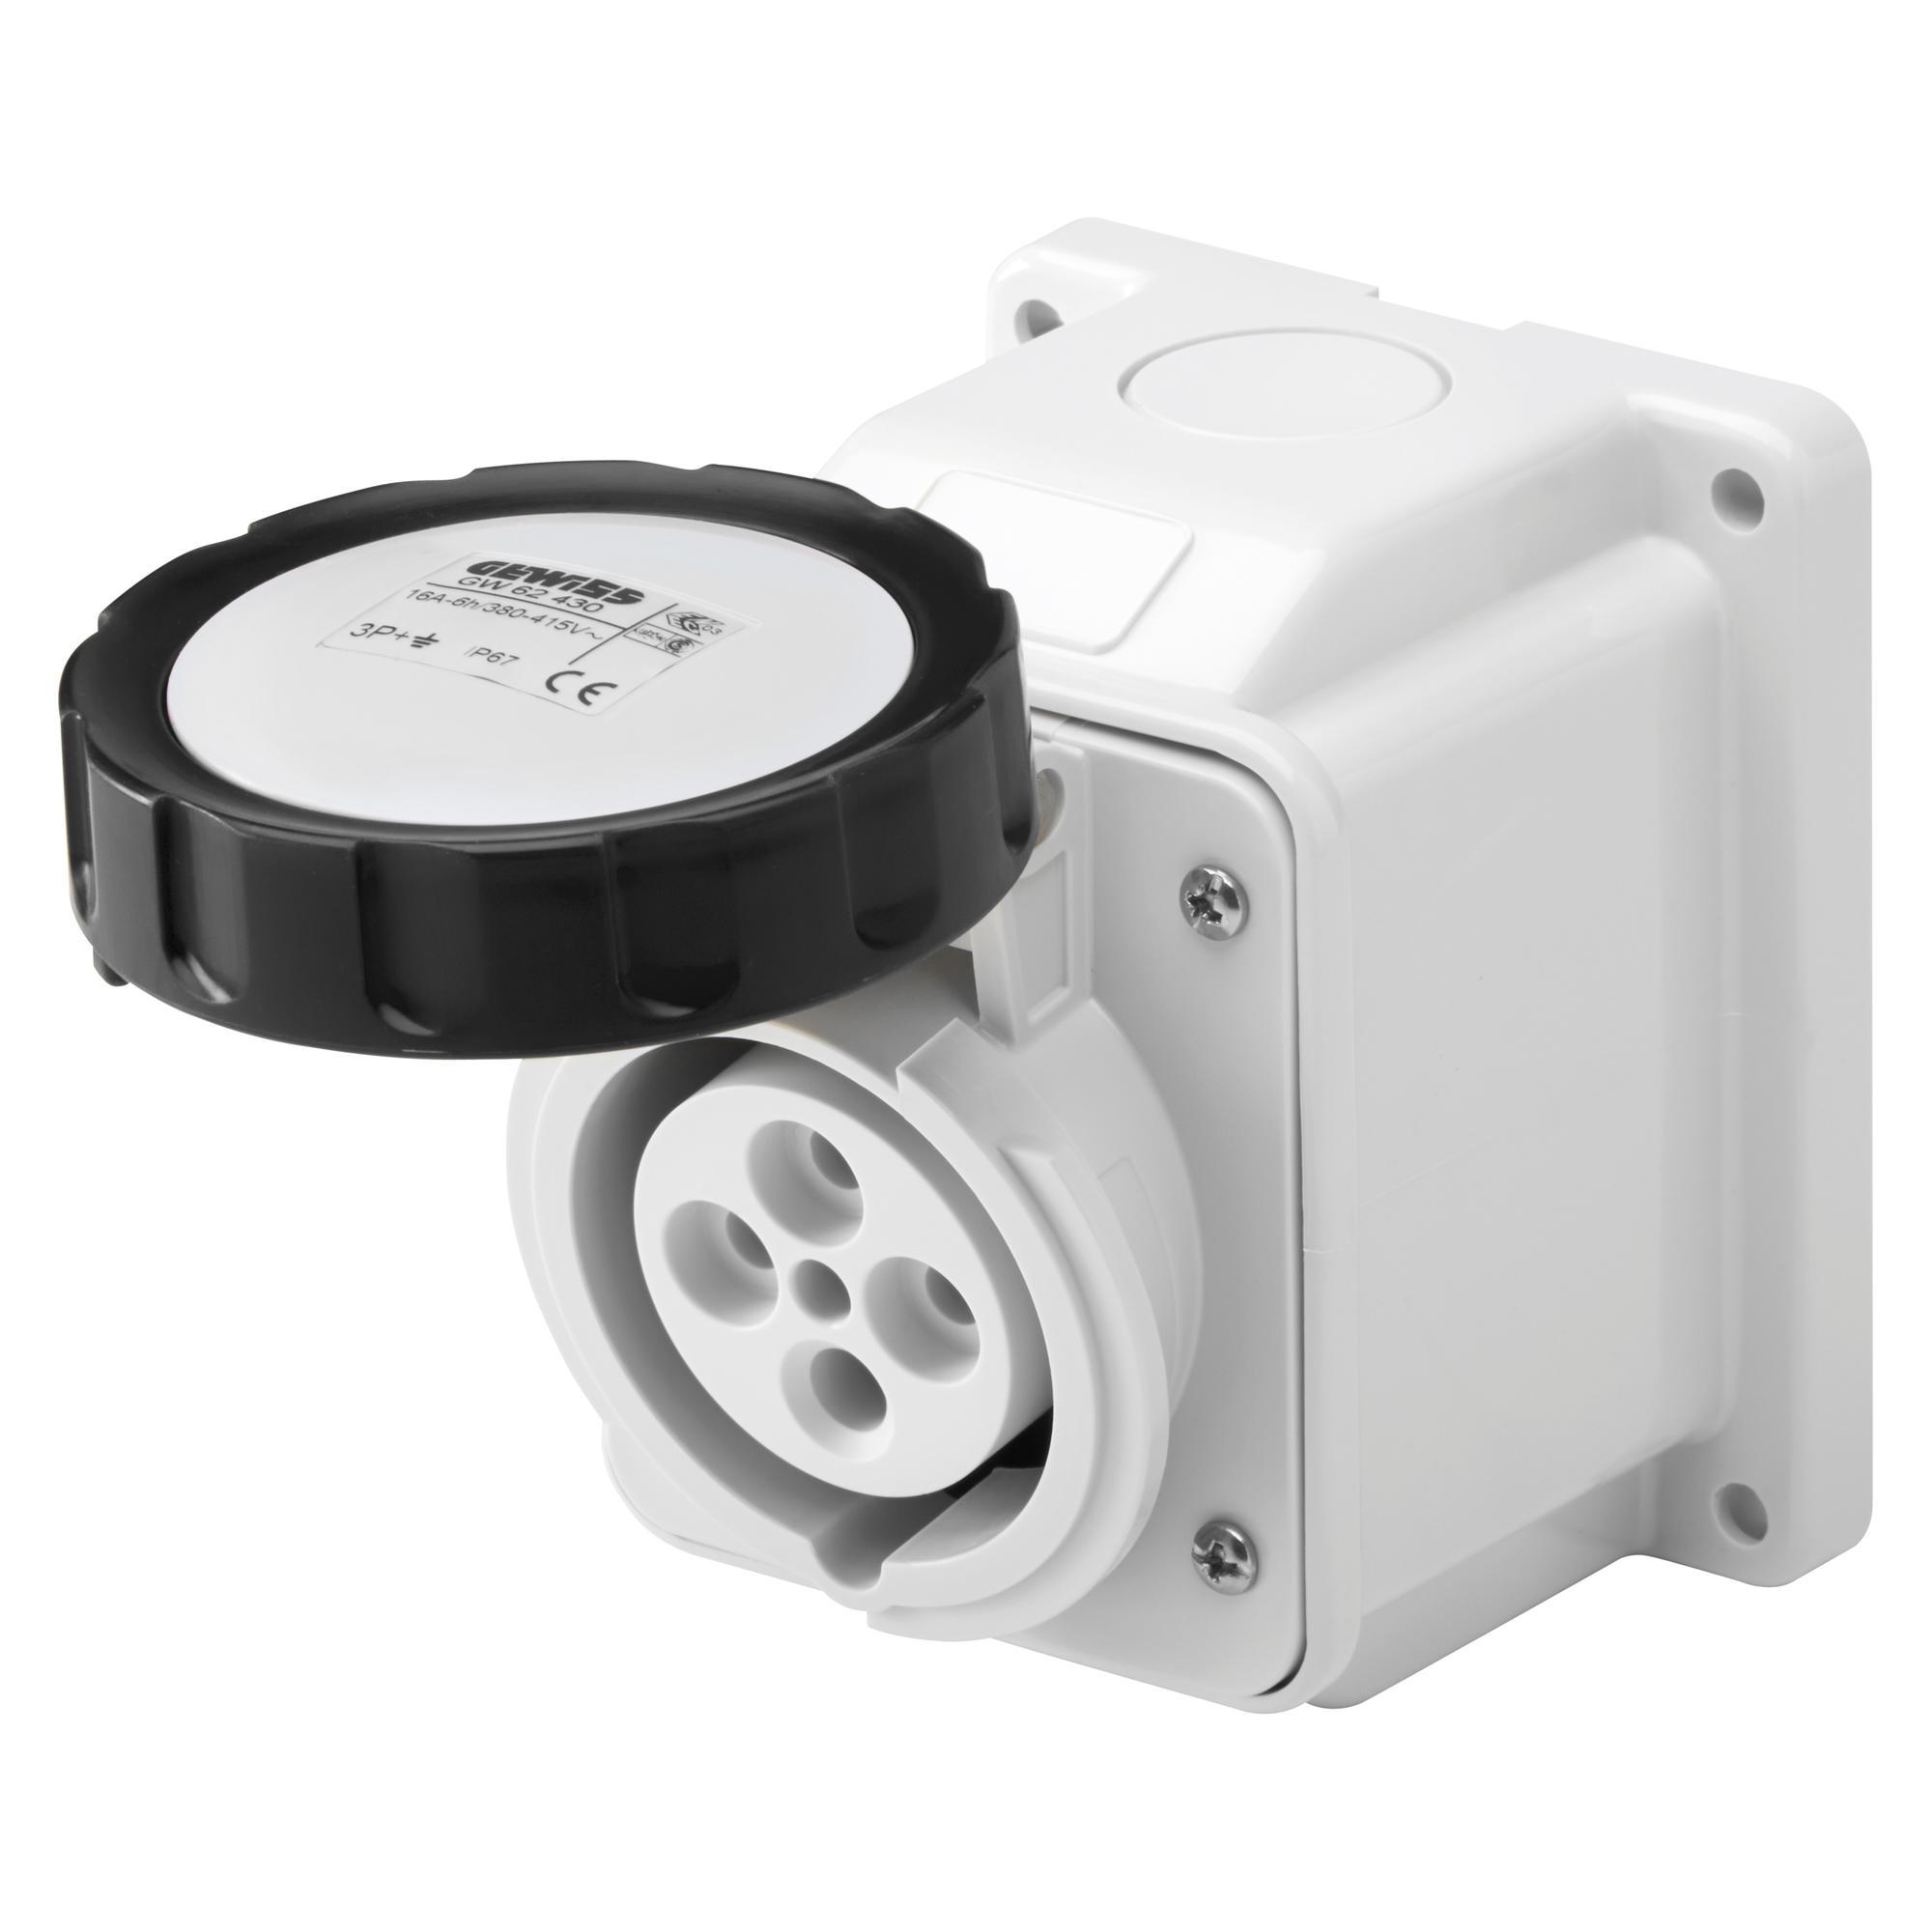 Socket Outlet Gw62433 Gewiss Wiring Diagram Switch Representative Image Download Photo